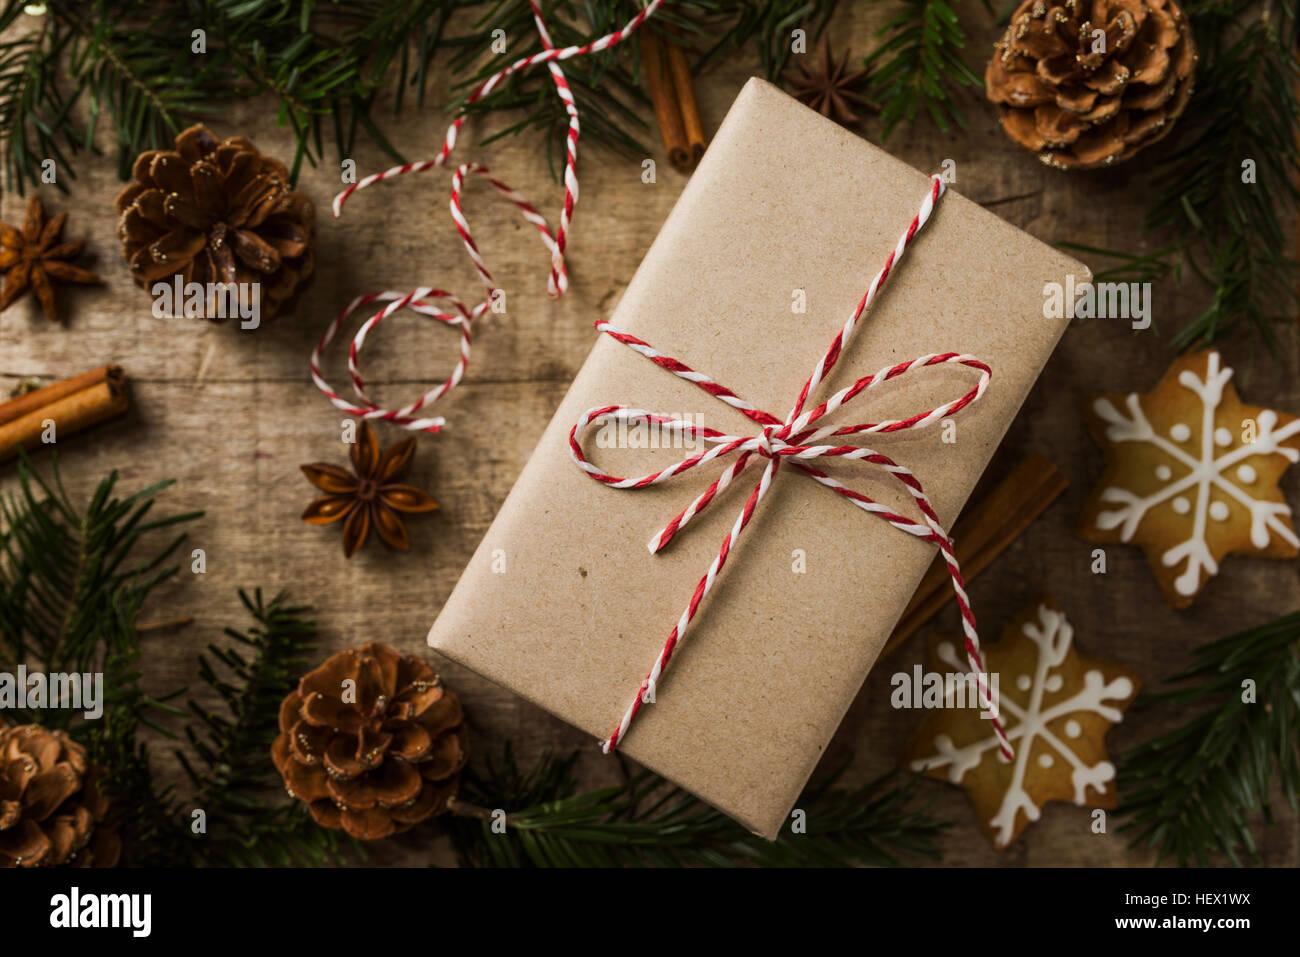 Regalo de navidad envueltos en papel kraft natural rodeado de d Imagen De Stock